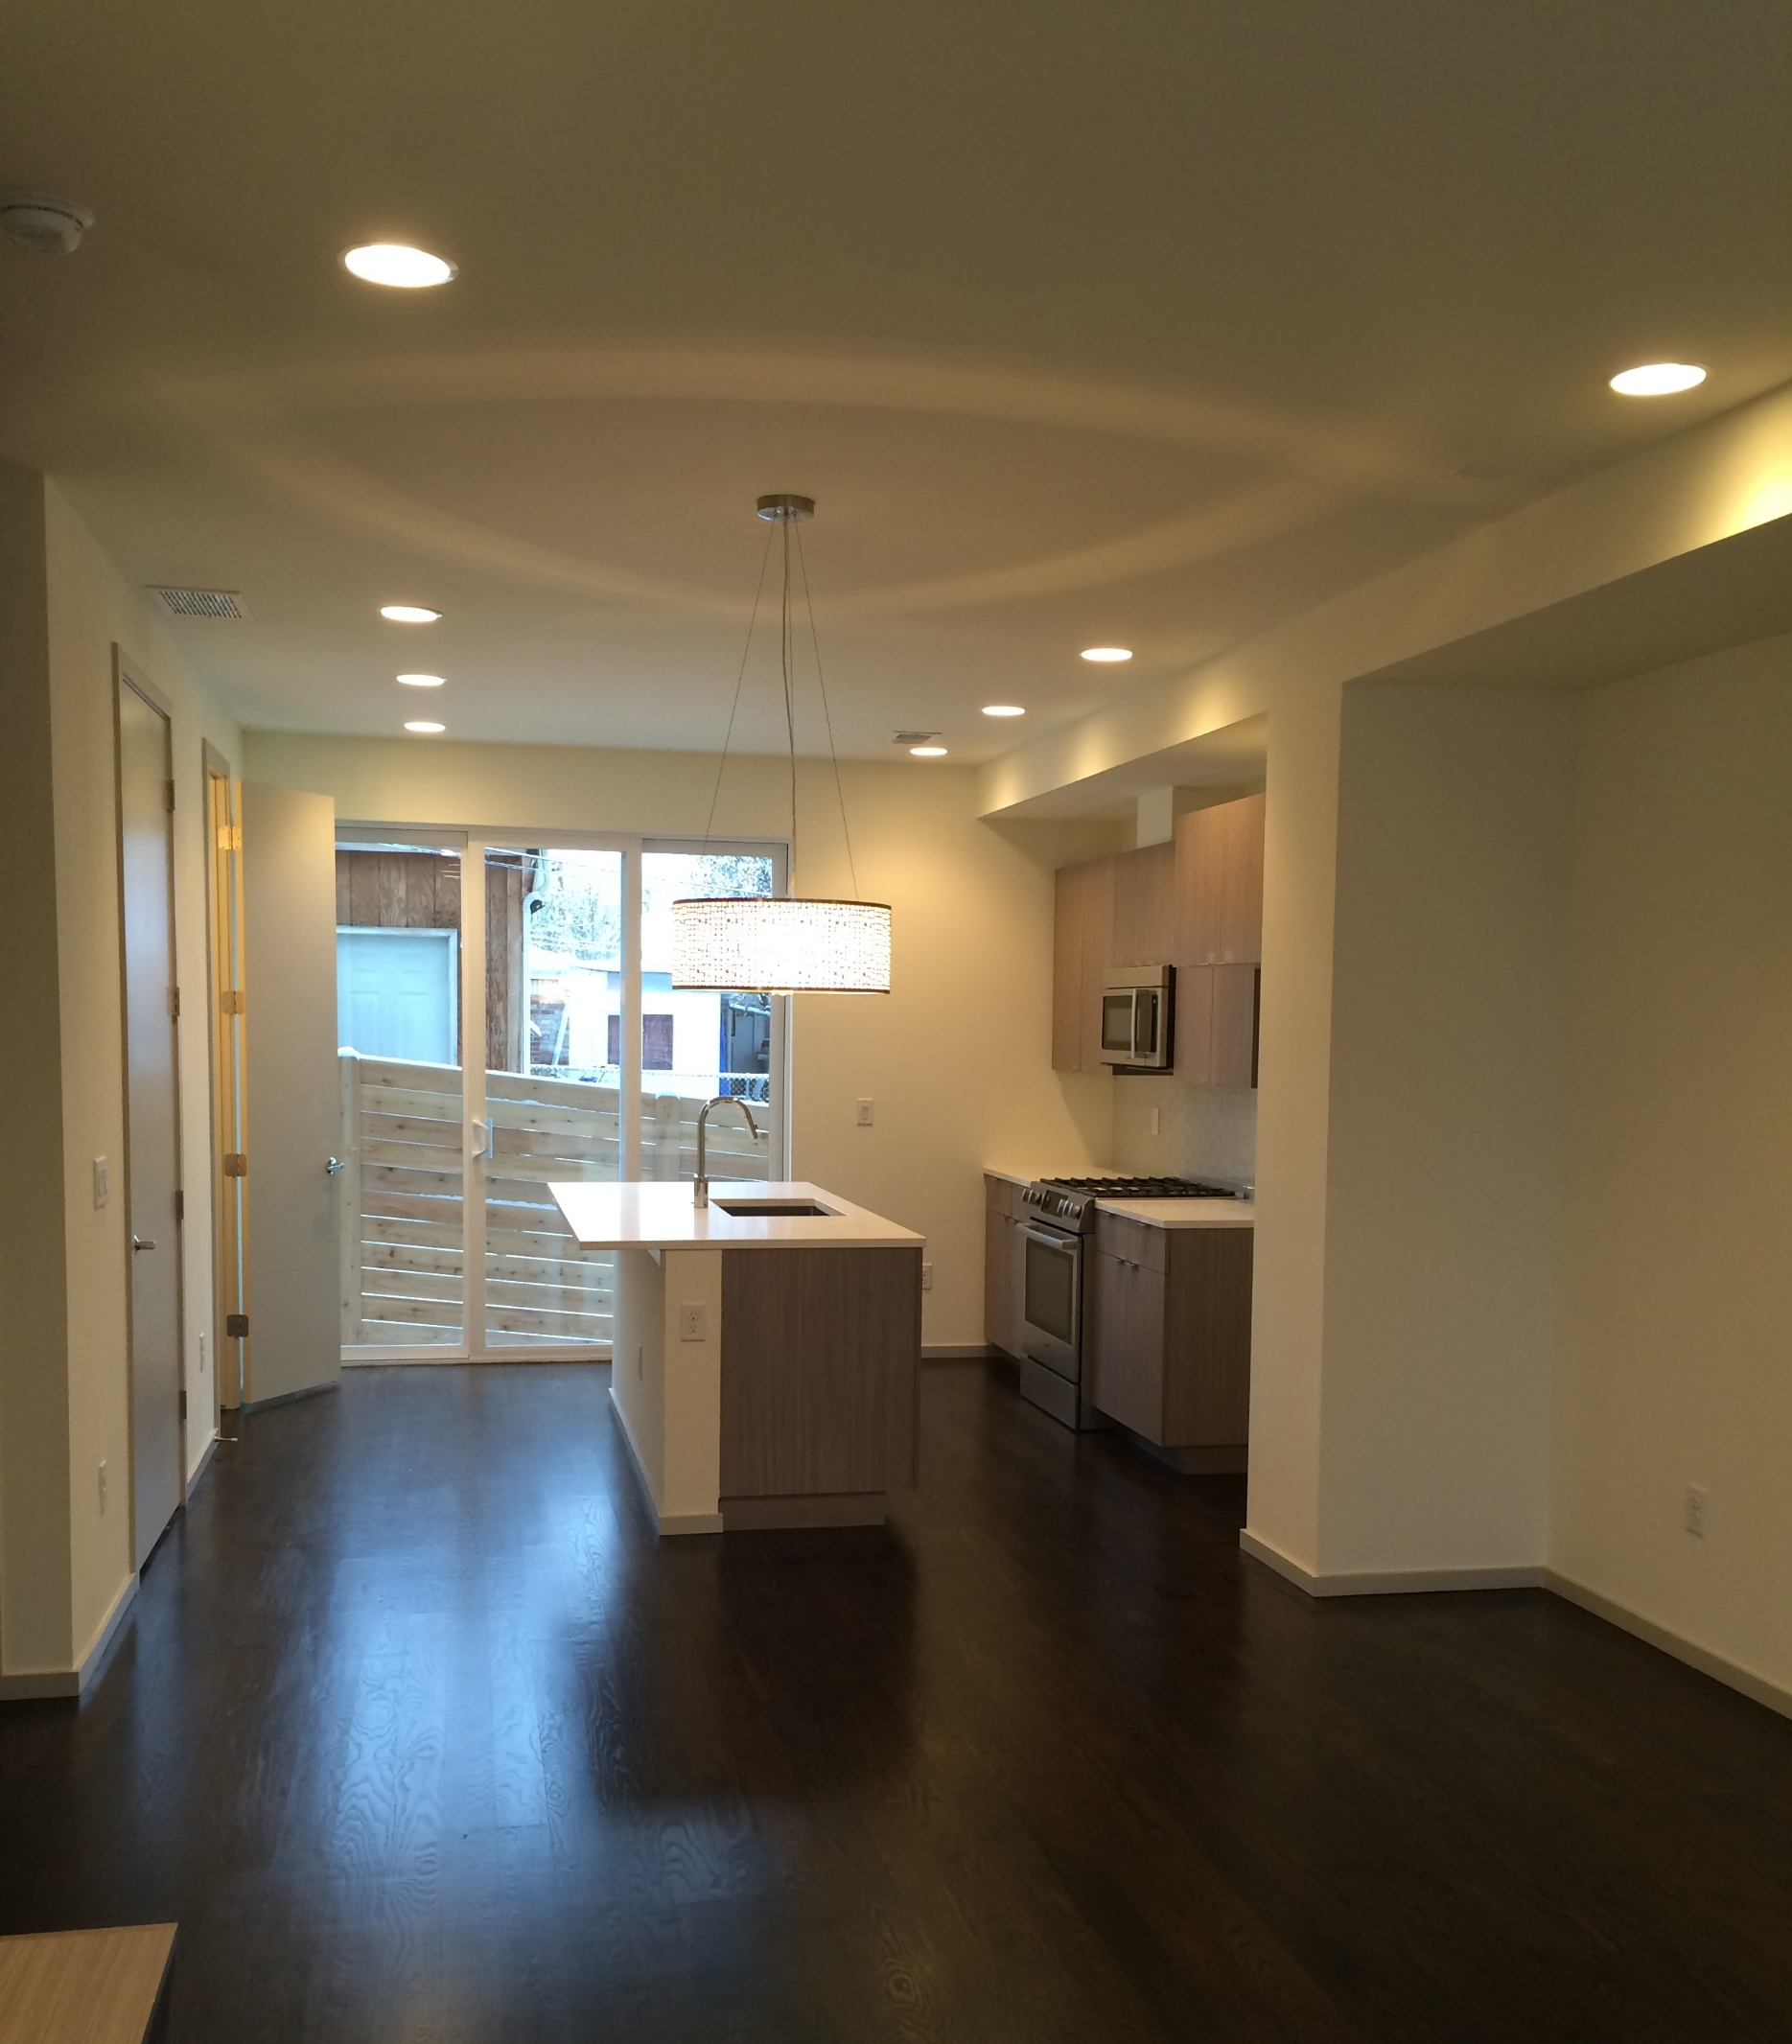 tan keith bedroom modern floor type plan g boon kee martin